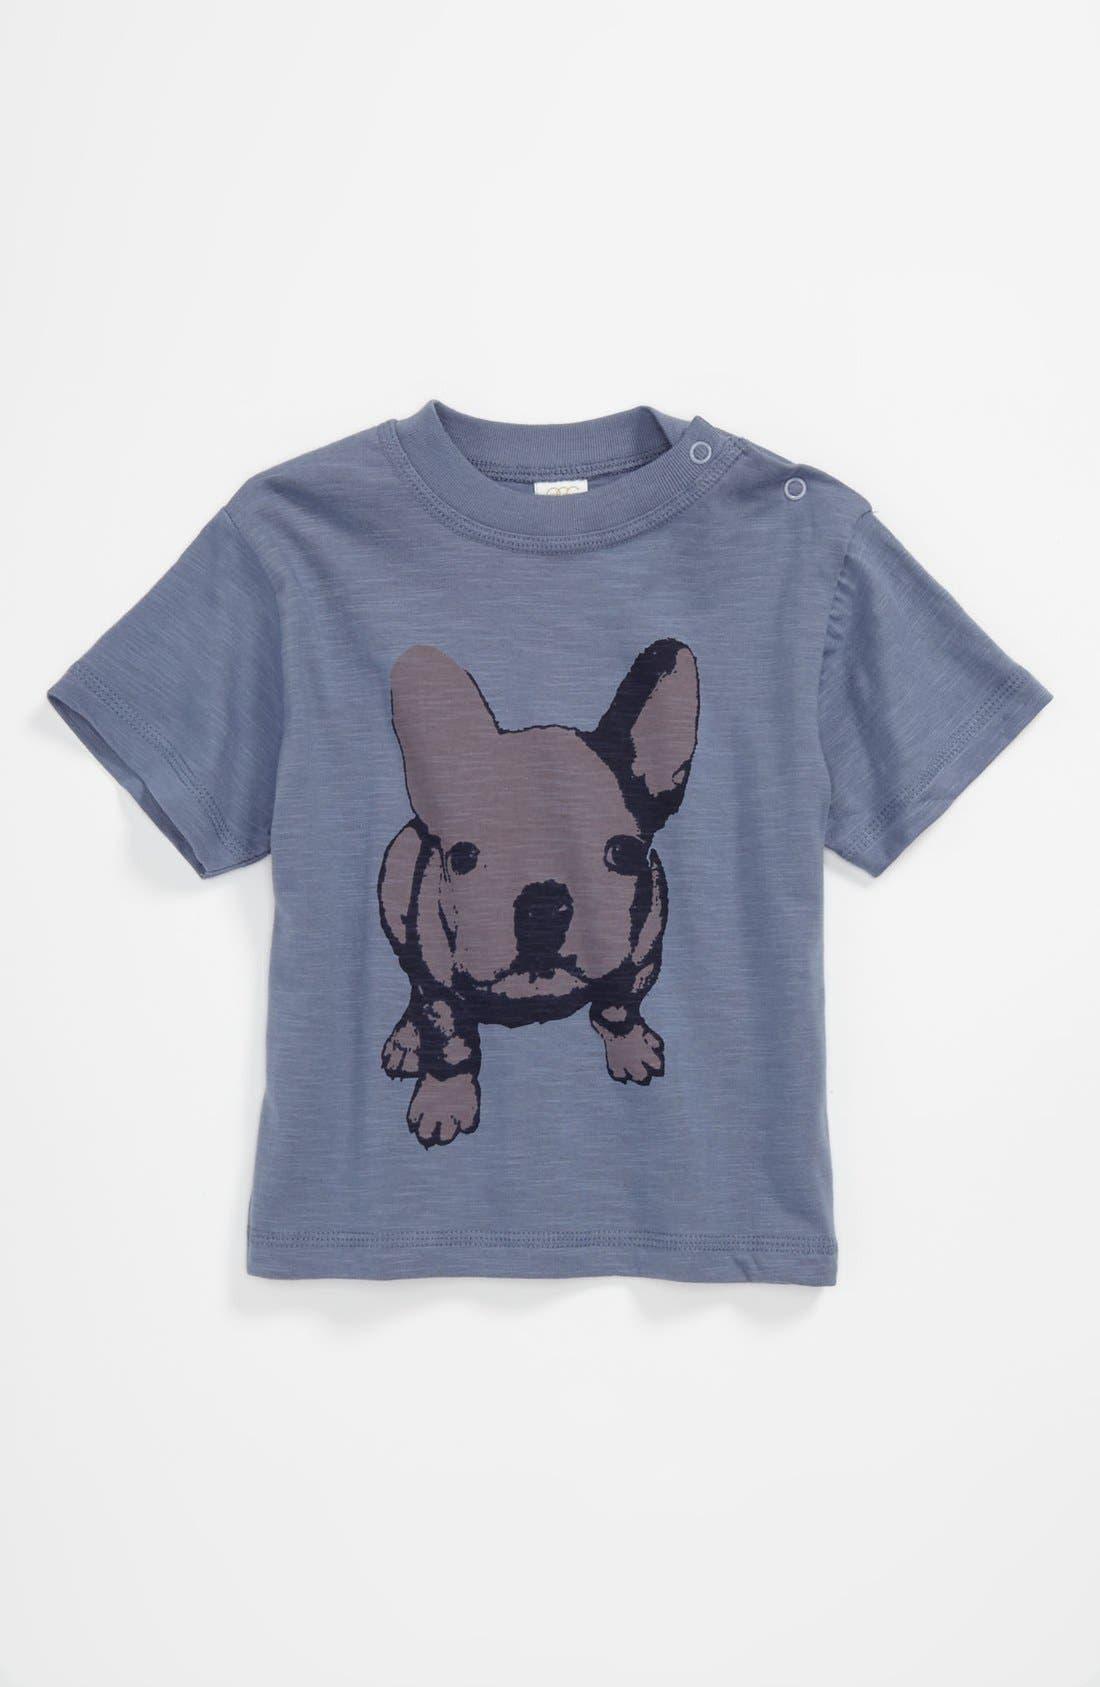 Alternate Image 1 Selected - egg by susan lazar Jersey T-Shirt (Toddler)